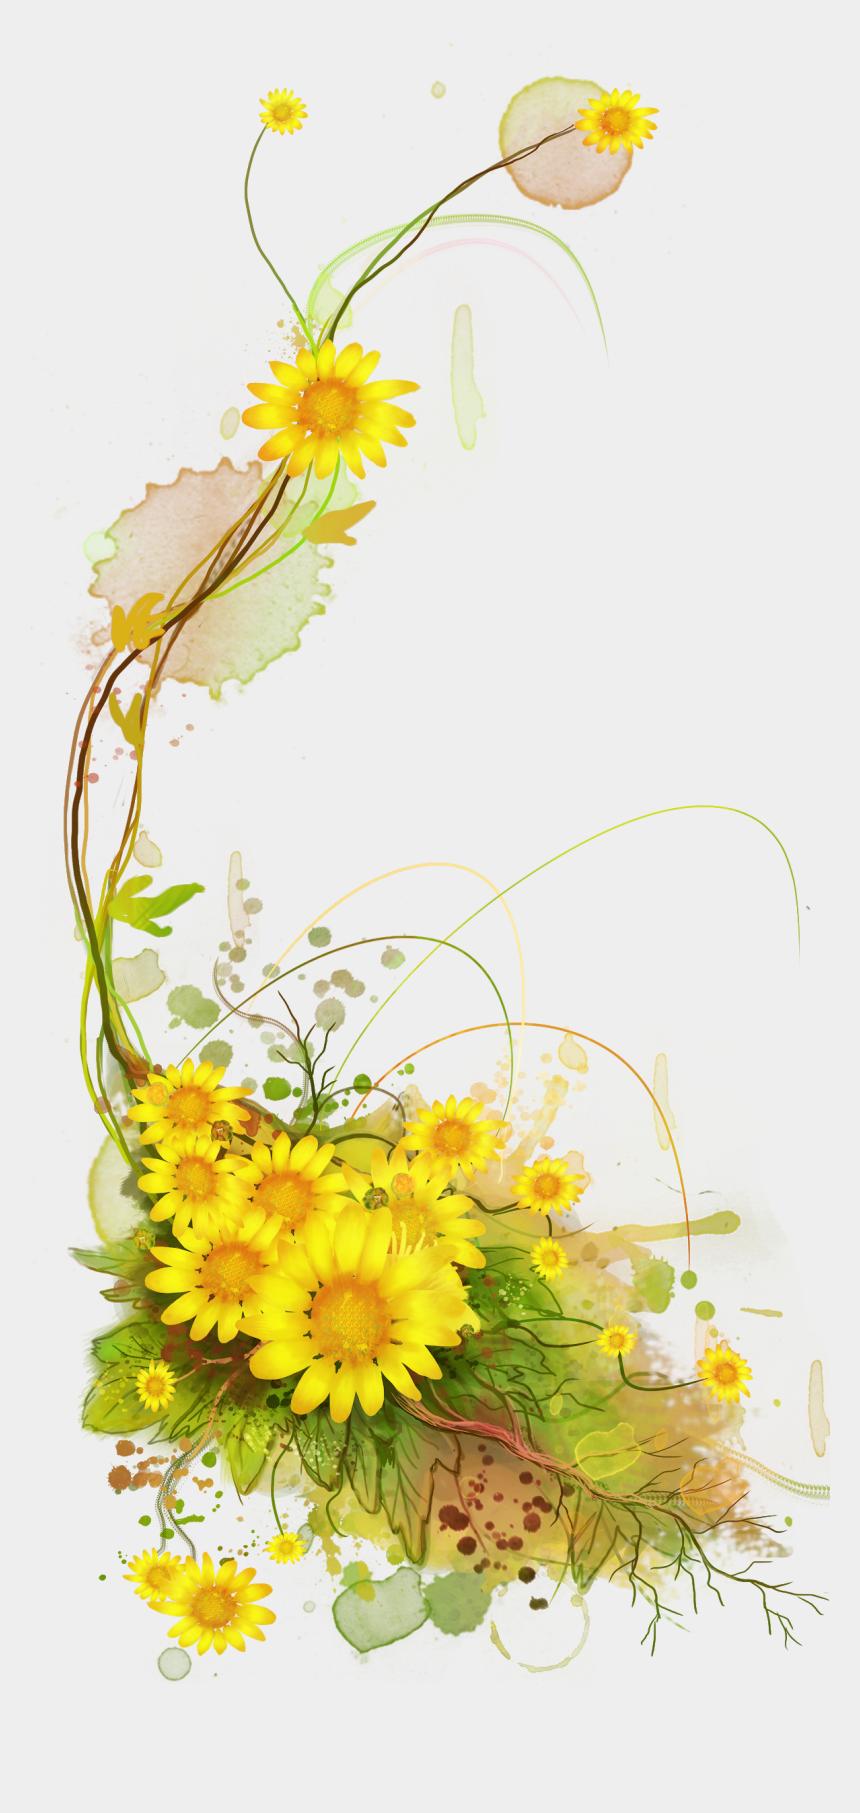 Sunflower Frame Png - Sunflower Clipart Frame Png ...